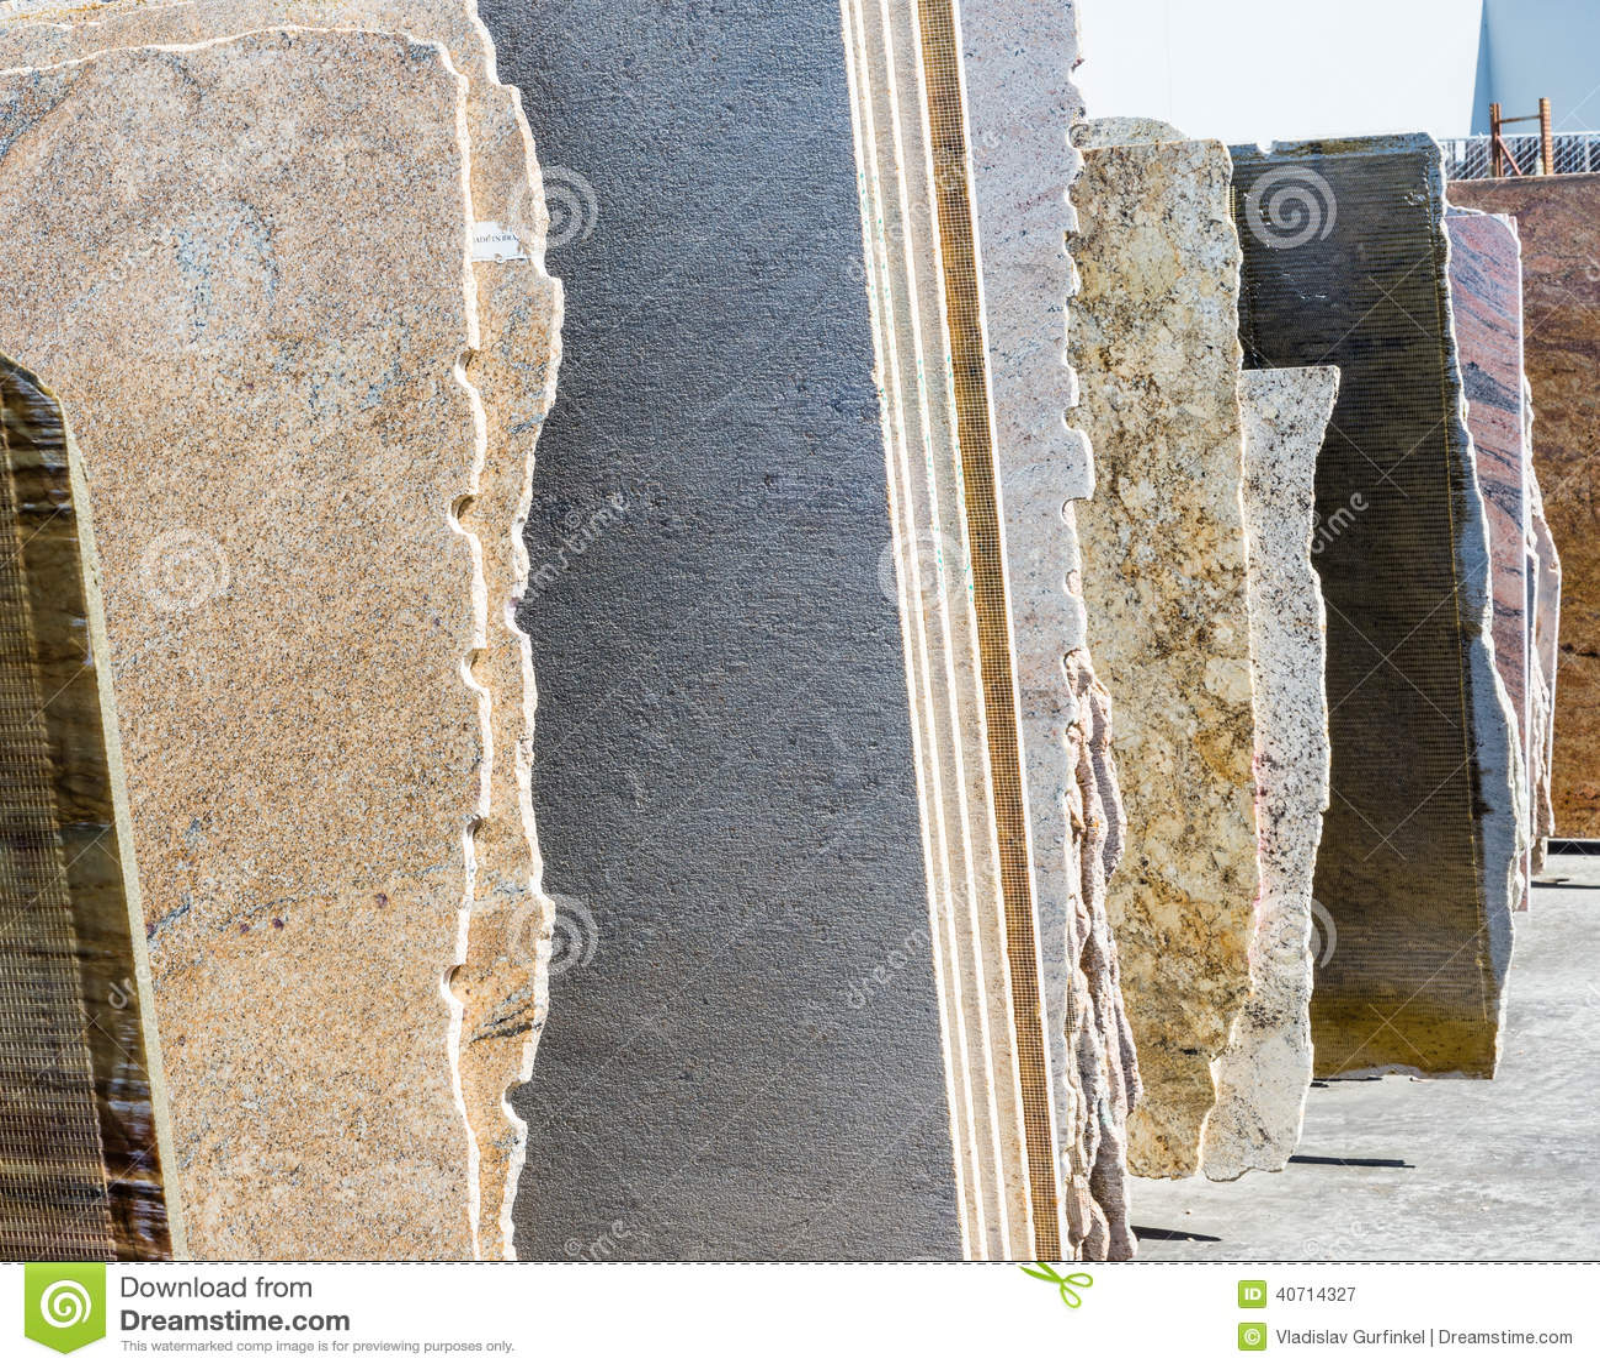 Granite Slab Yards : Colorful granite slabs for sale in store yard.